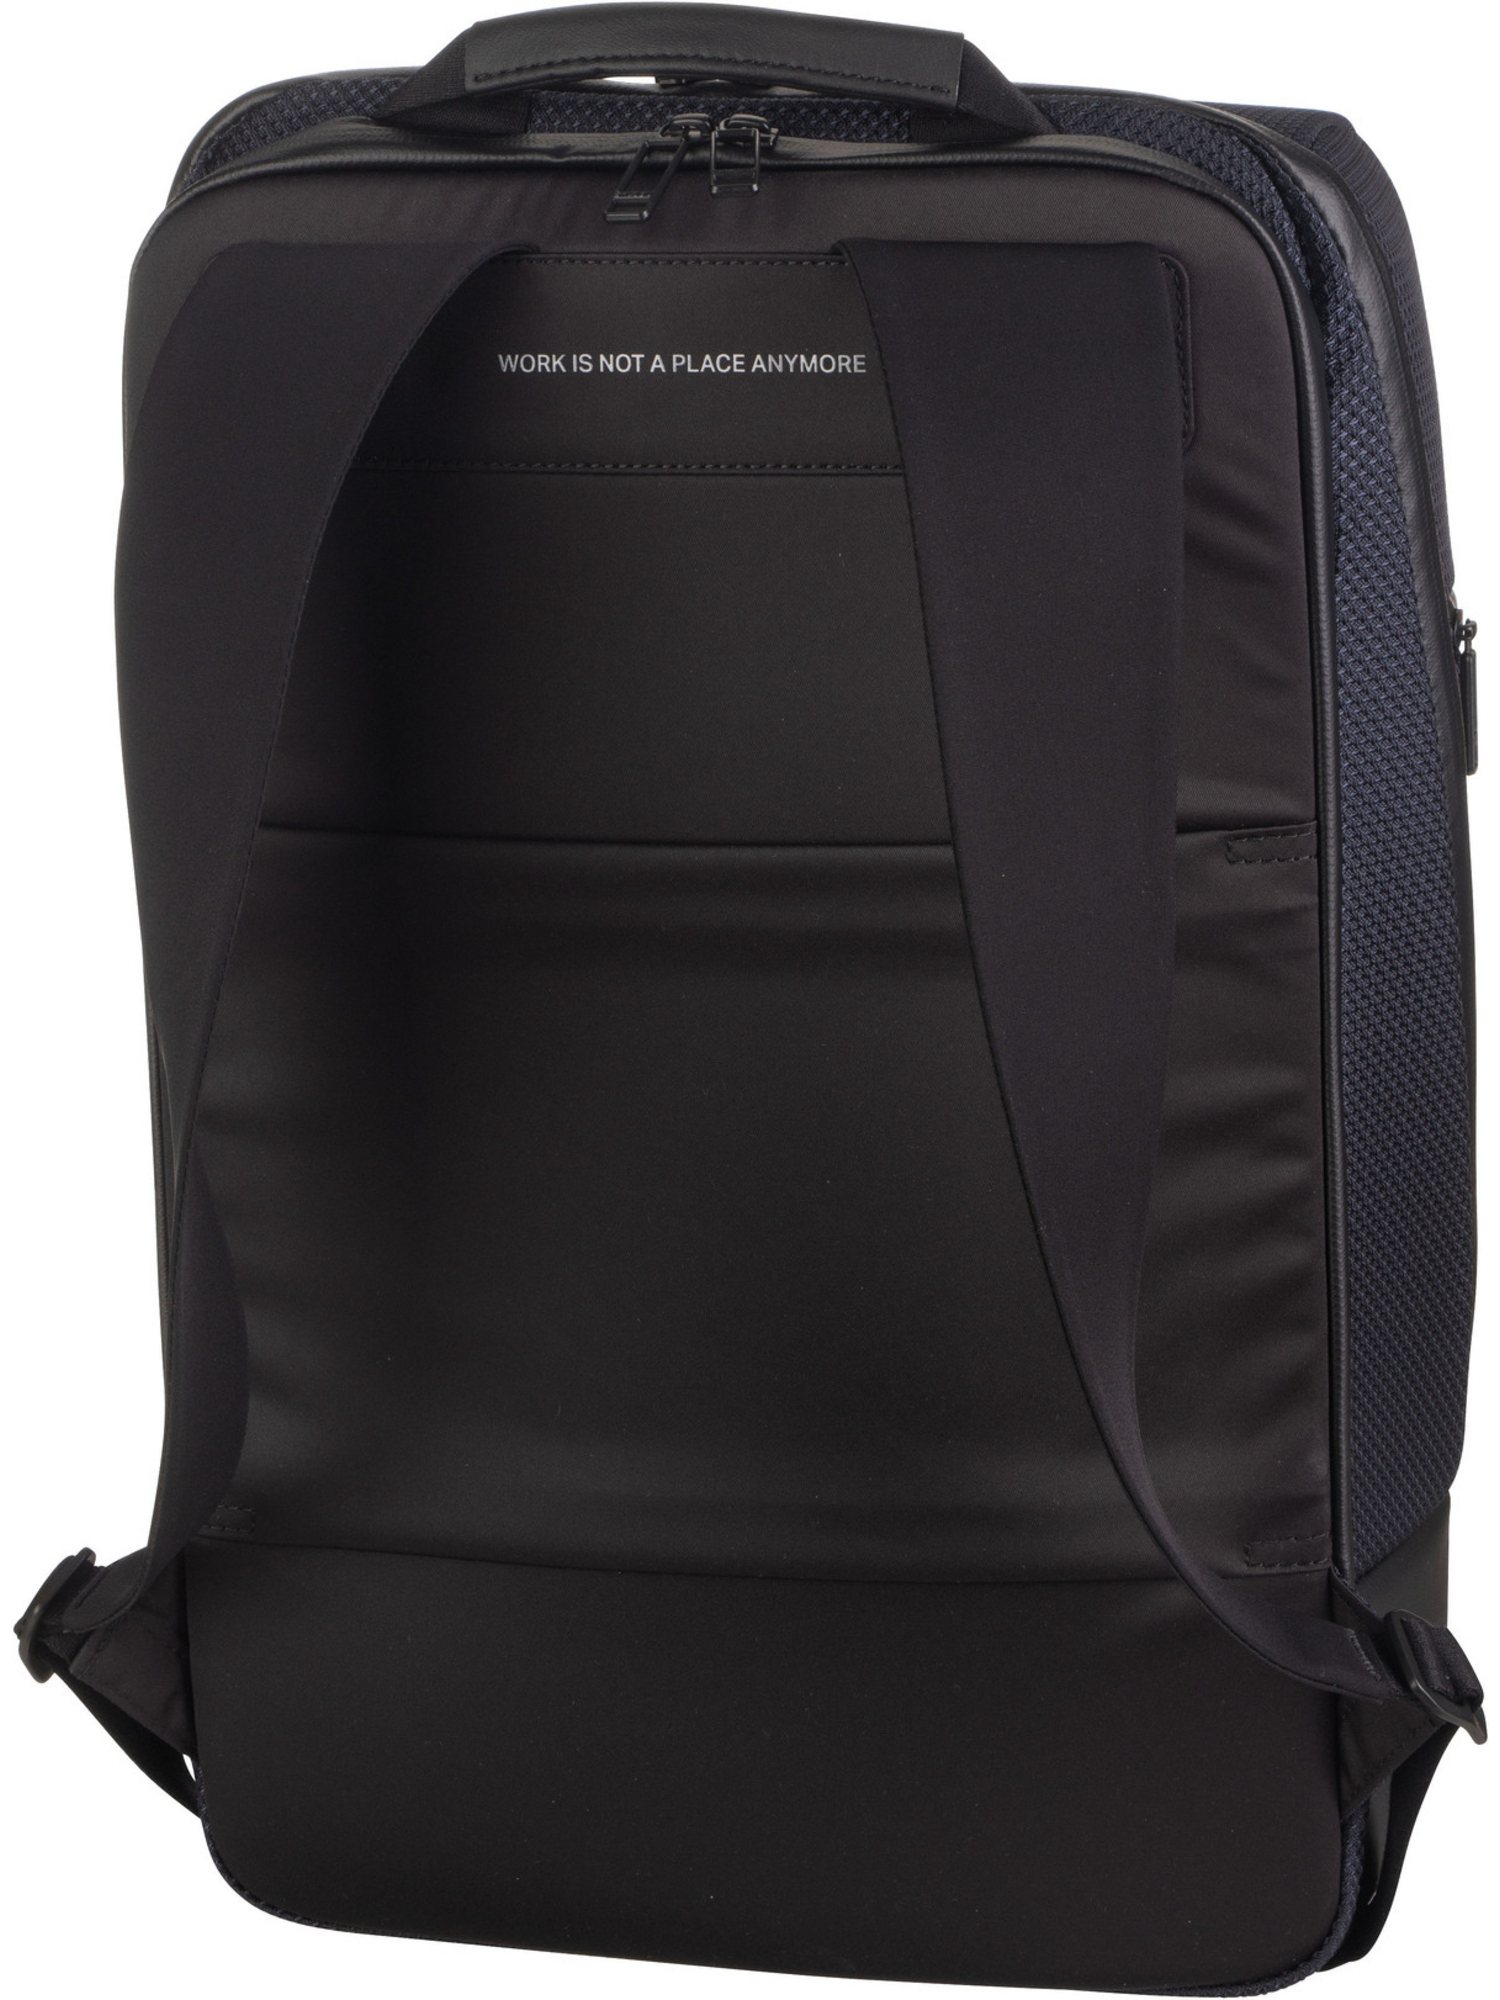 Salzen: Sharp Business Backpack Fabric